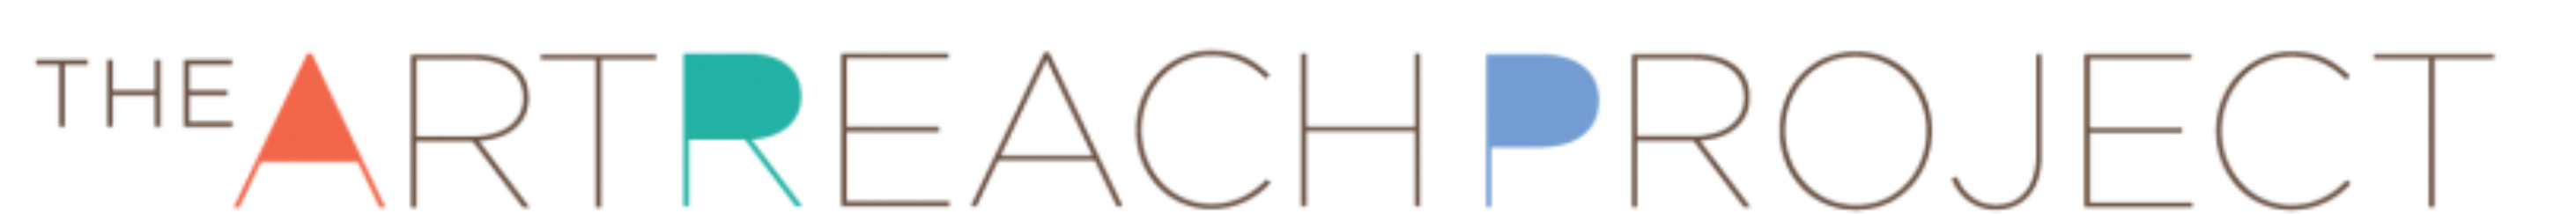 ArttReachProject logo